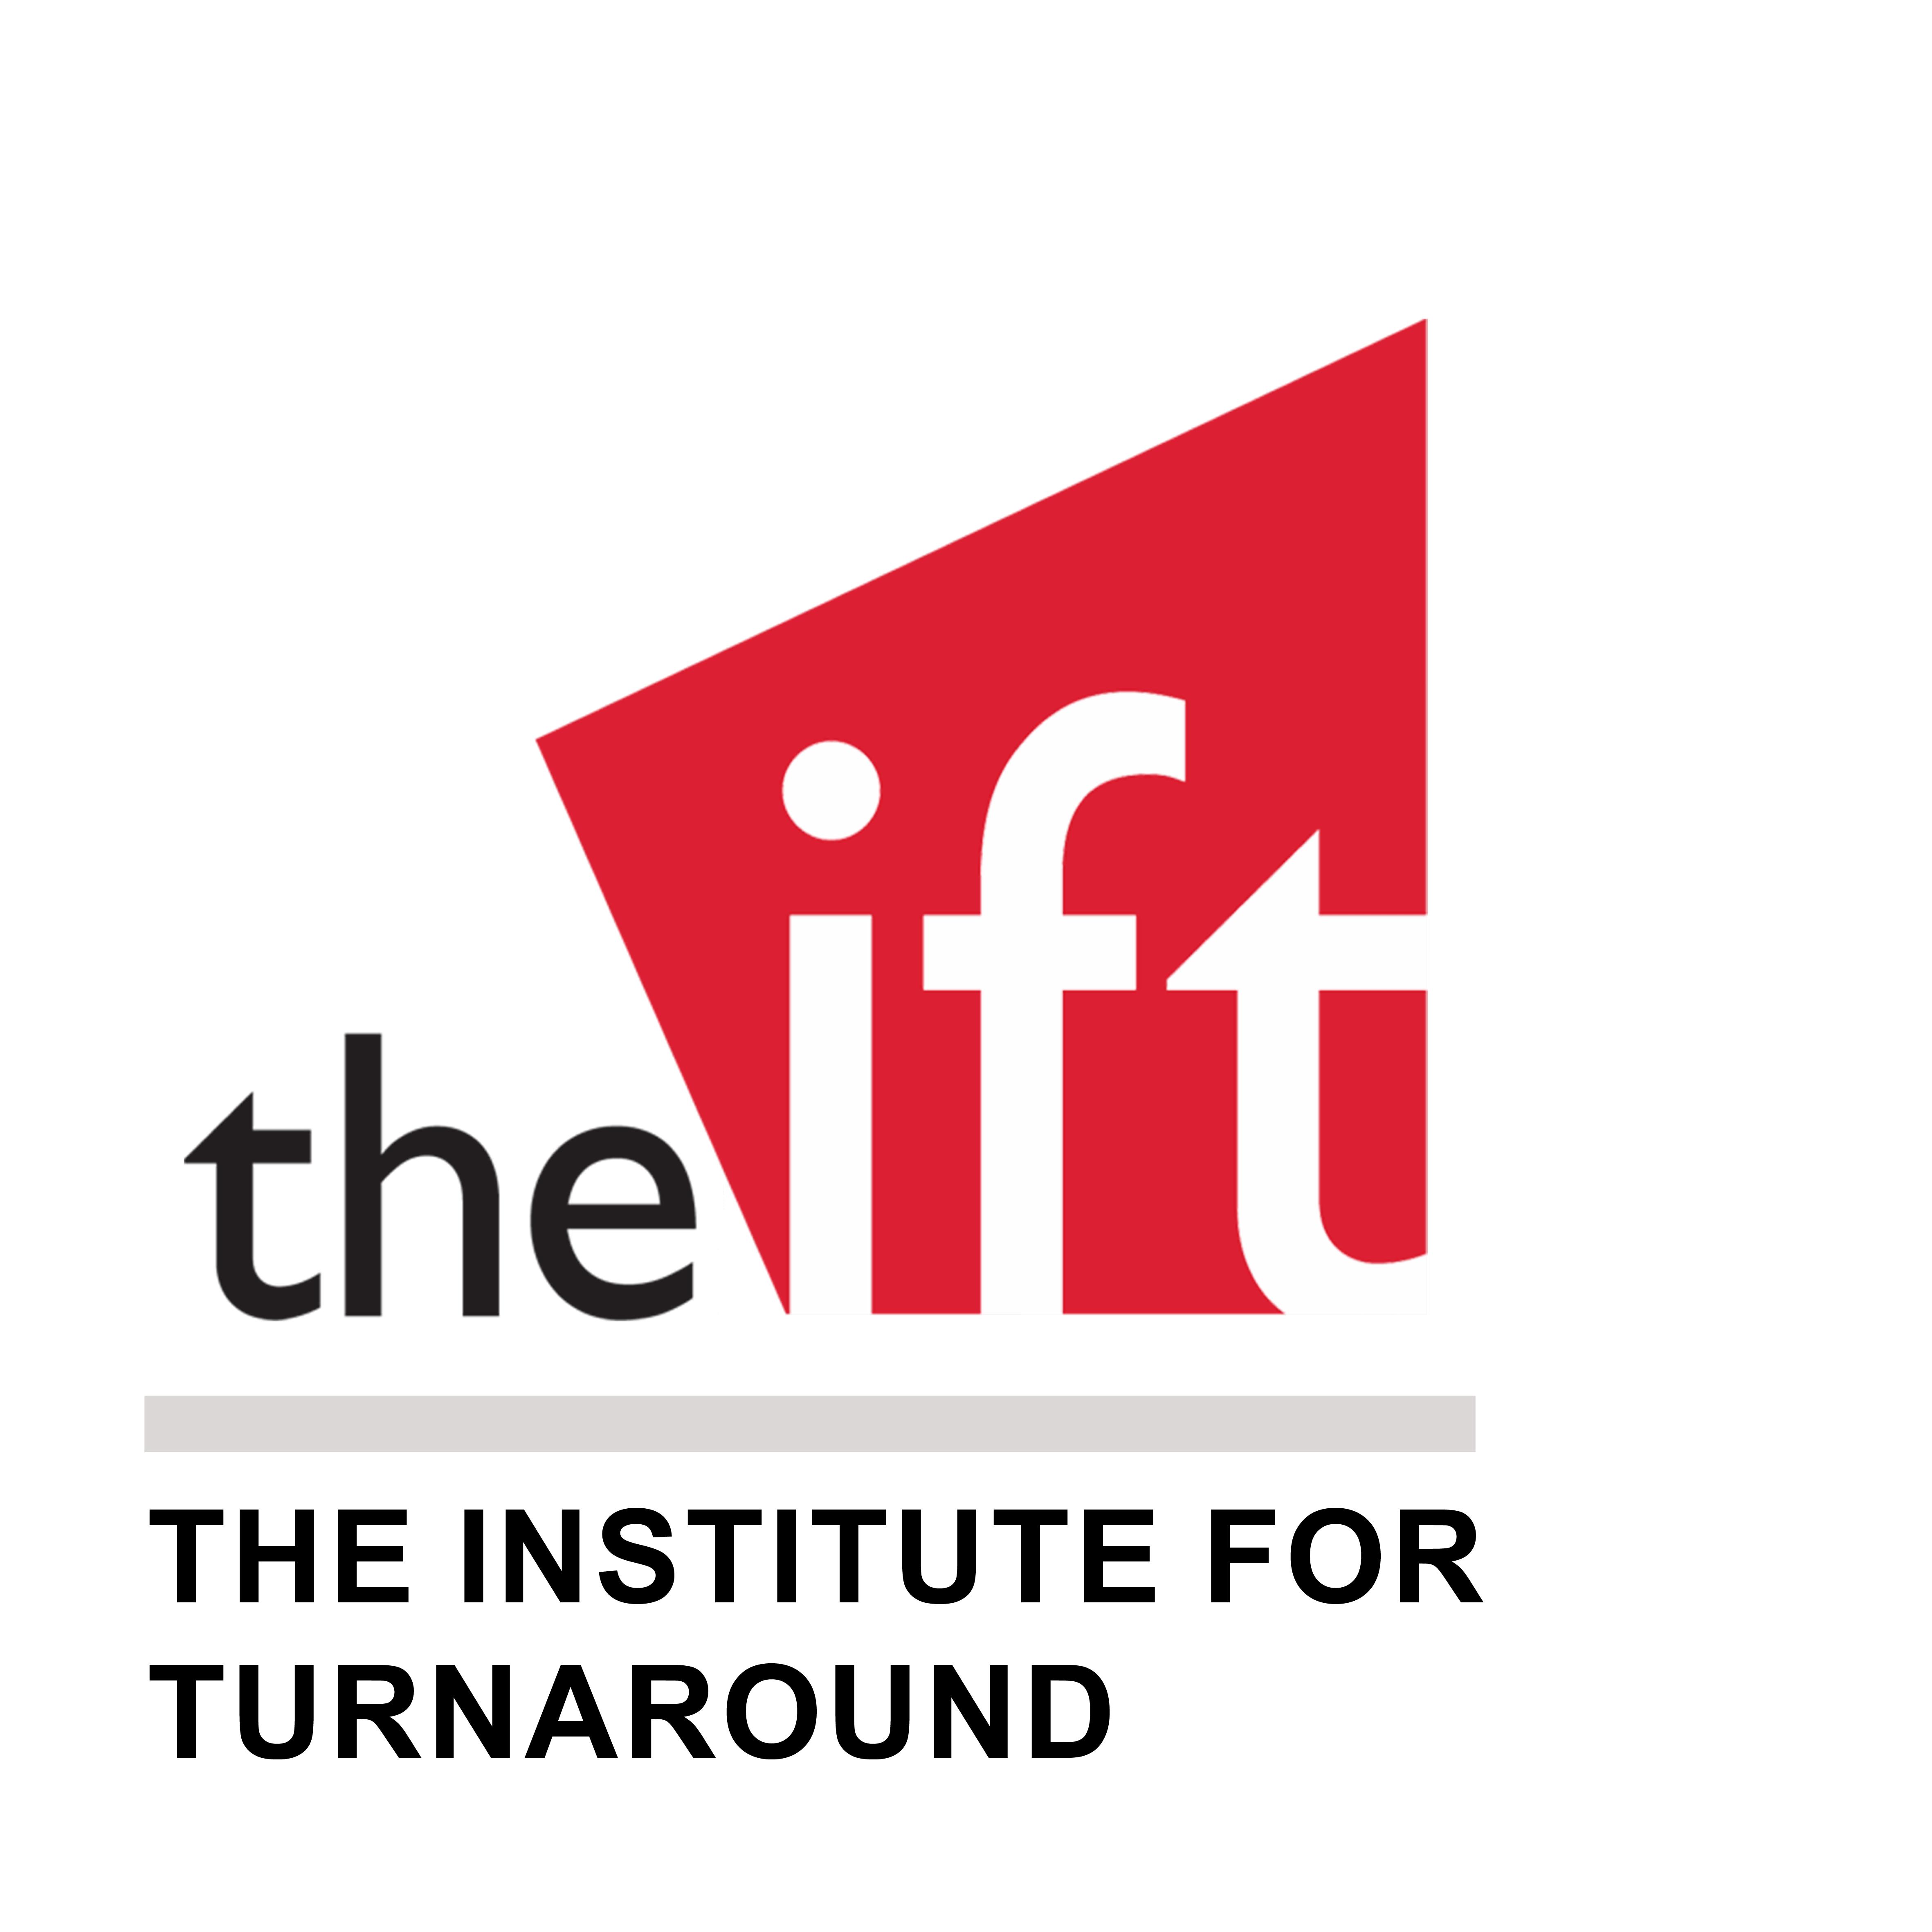 Institute for Turnaround